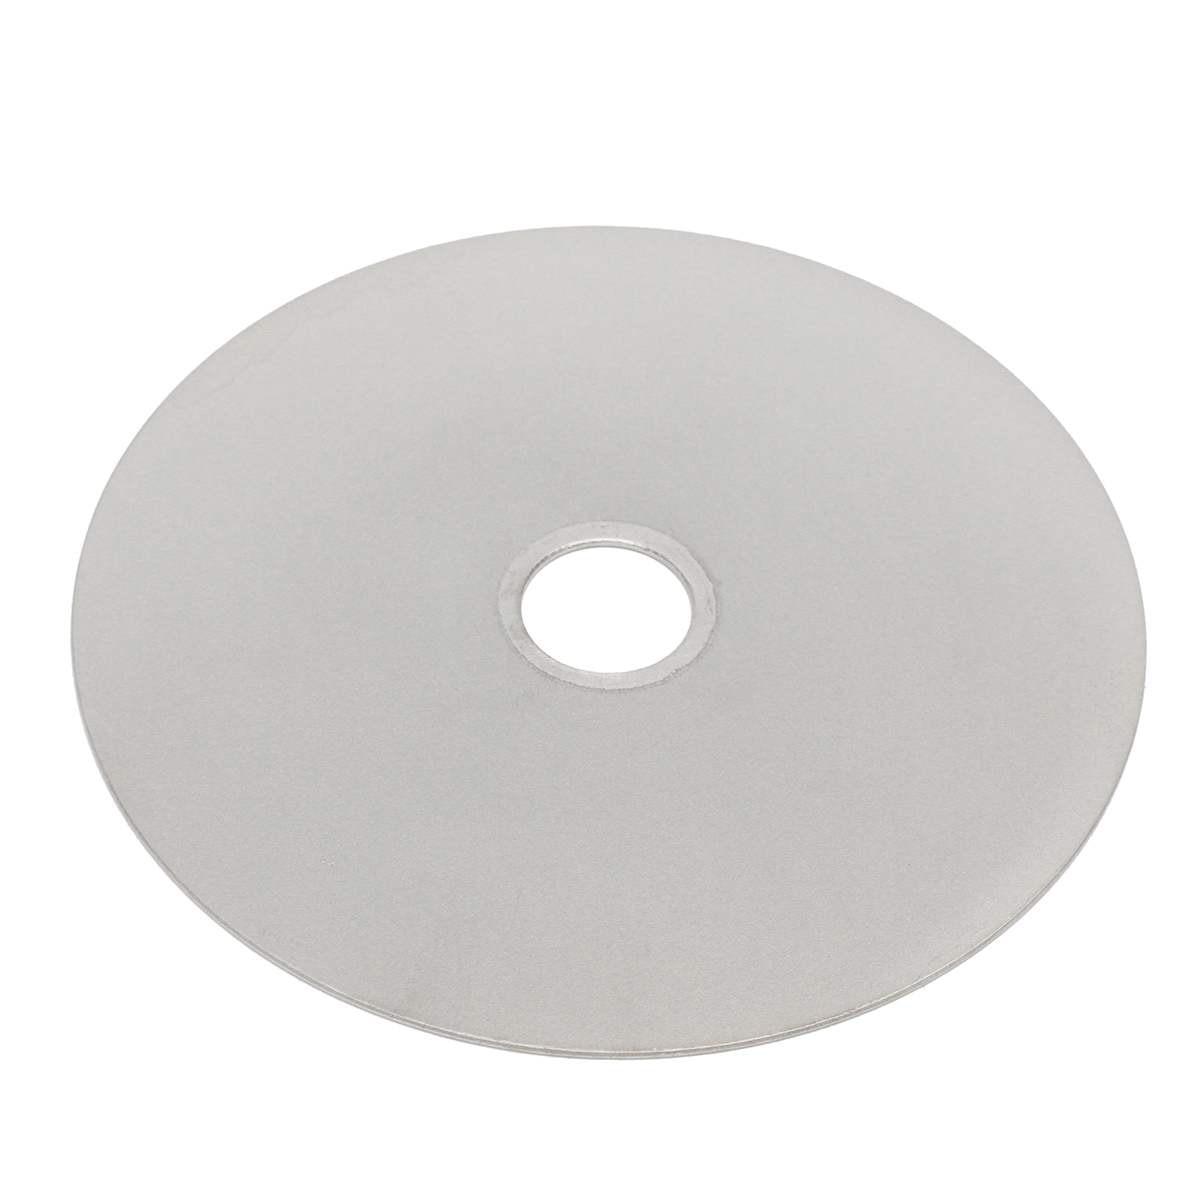 4 Inch 3000 Grit Diamond Coated Flat Lap Wheel Polishing Grinding Disc Grinding Wheel Rotary Tool Diamond Discs Accessories 16mm